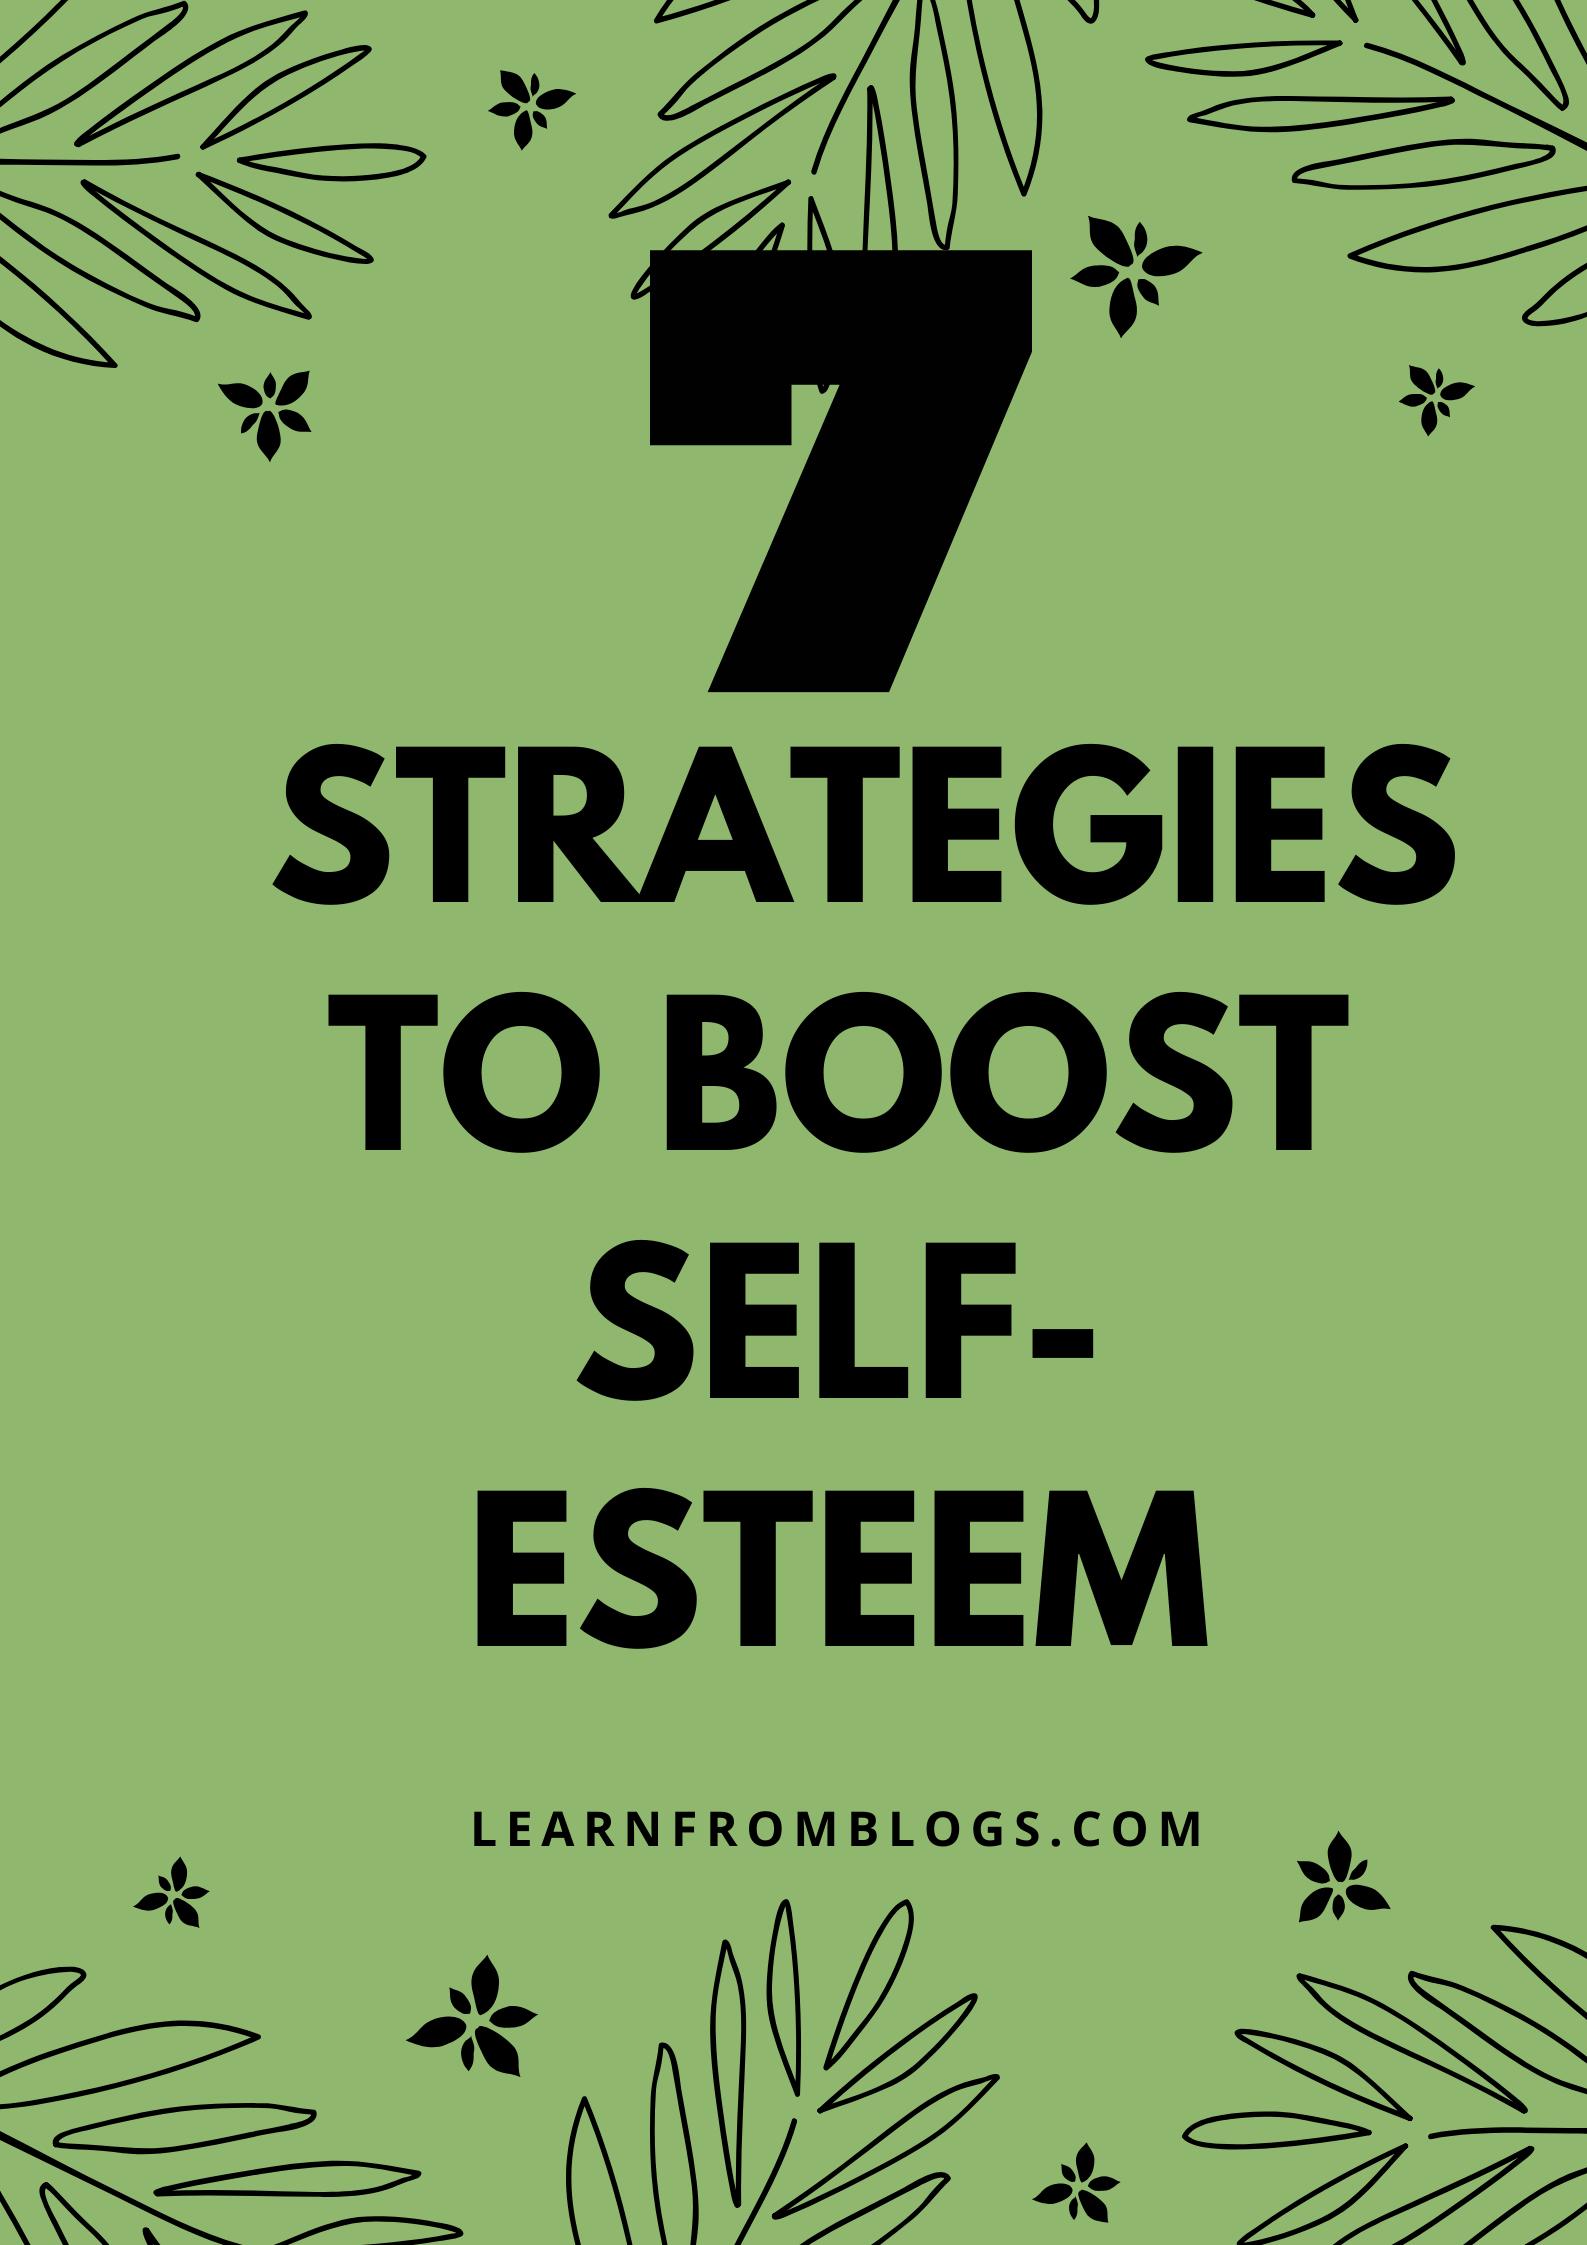 7 strategies to boost self-esteem.png